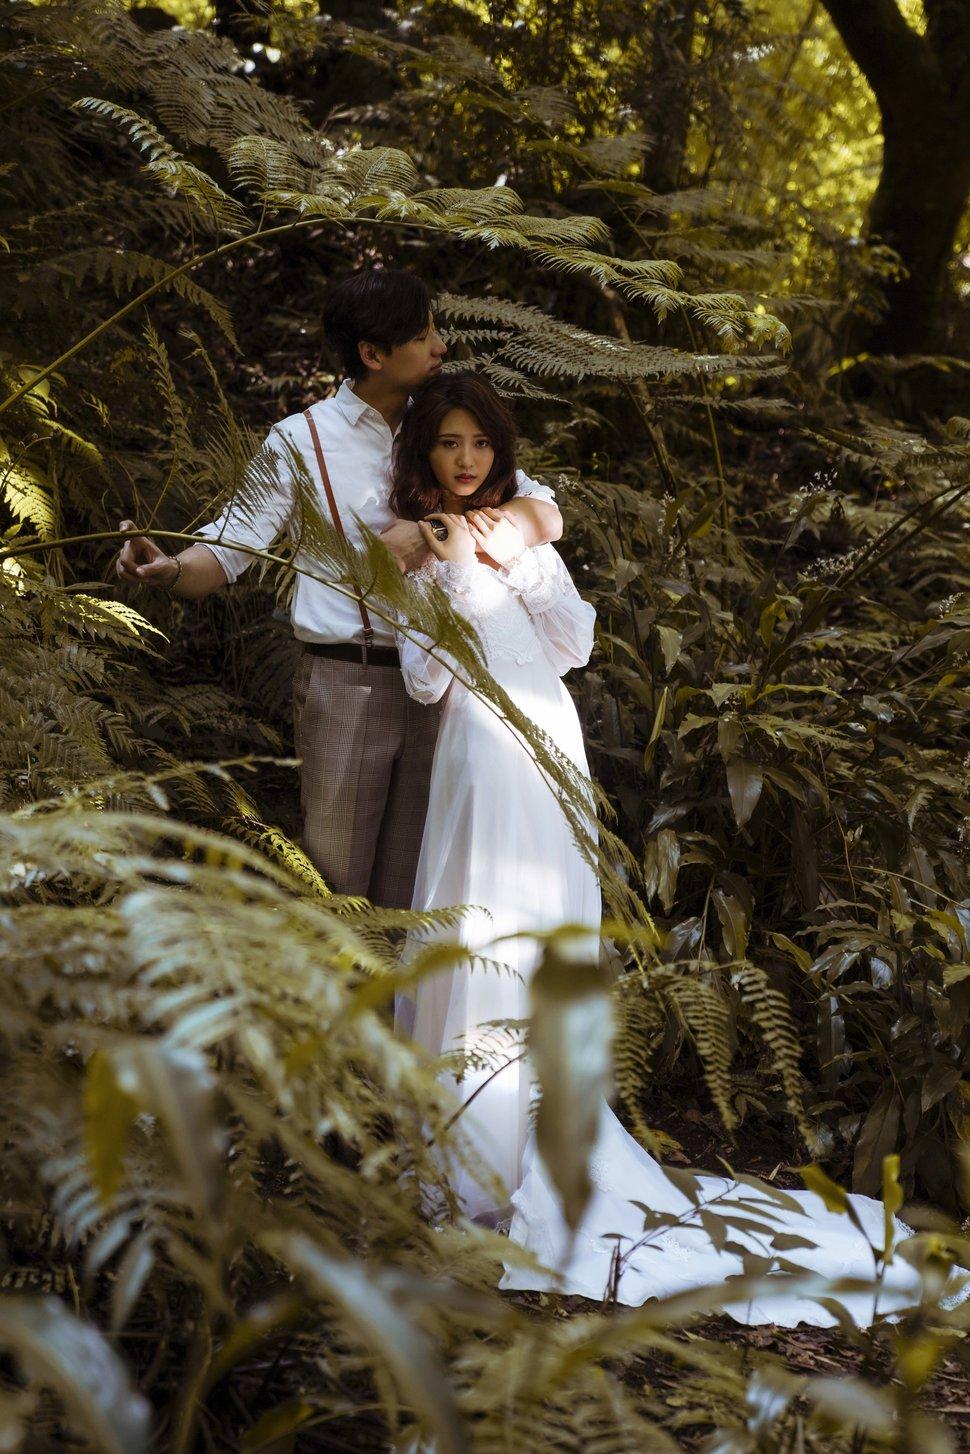 GM_06927 - GM俊彥 uxrw art studio - 結婚吧